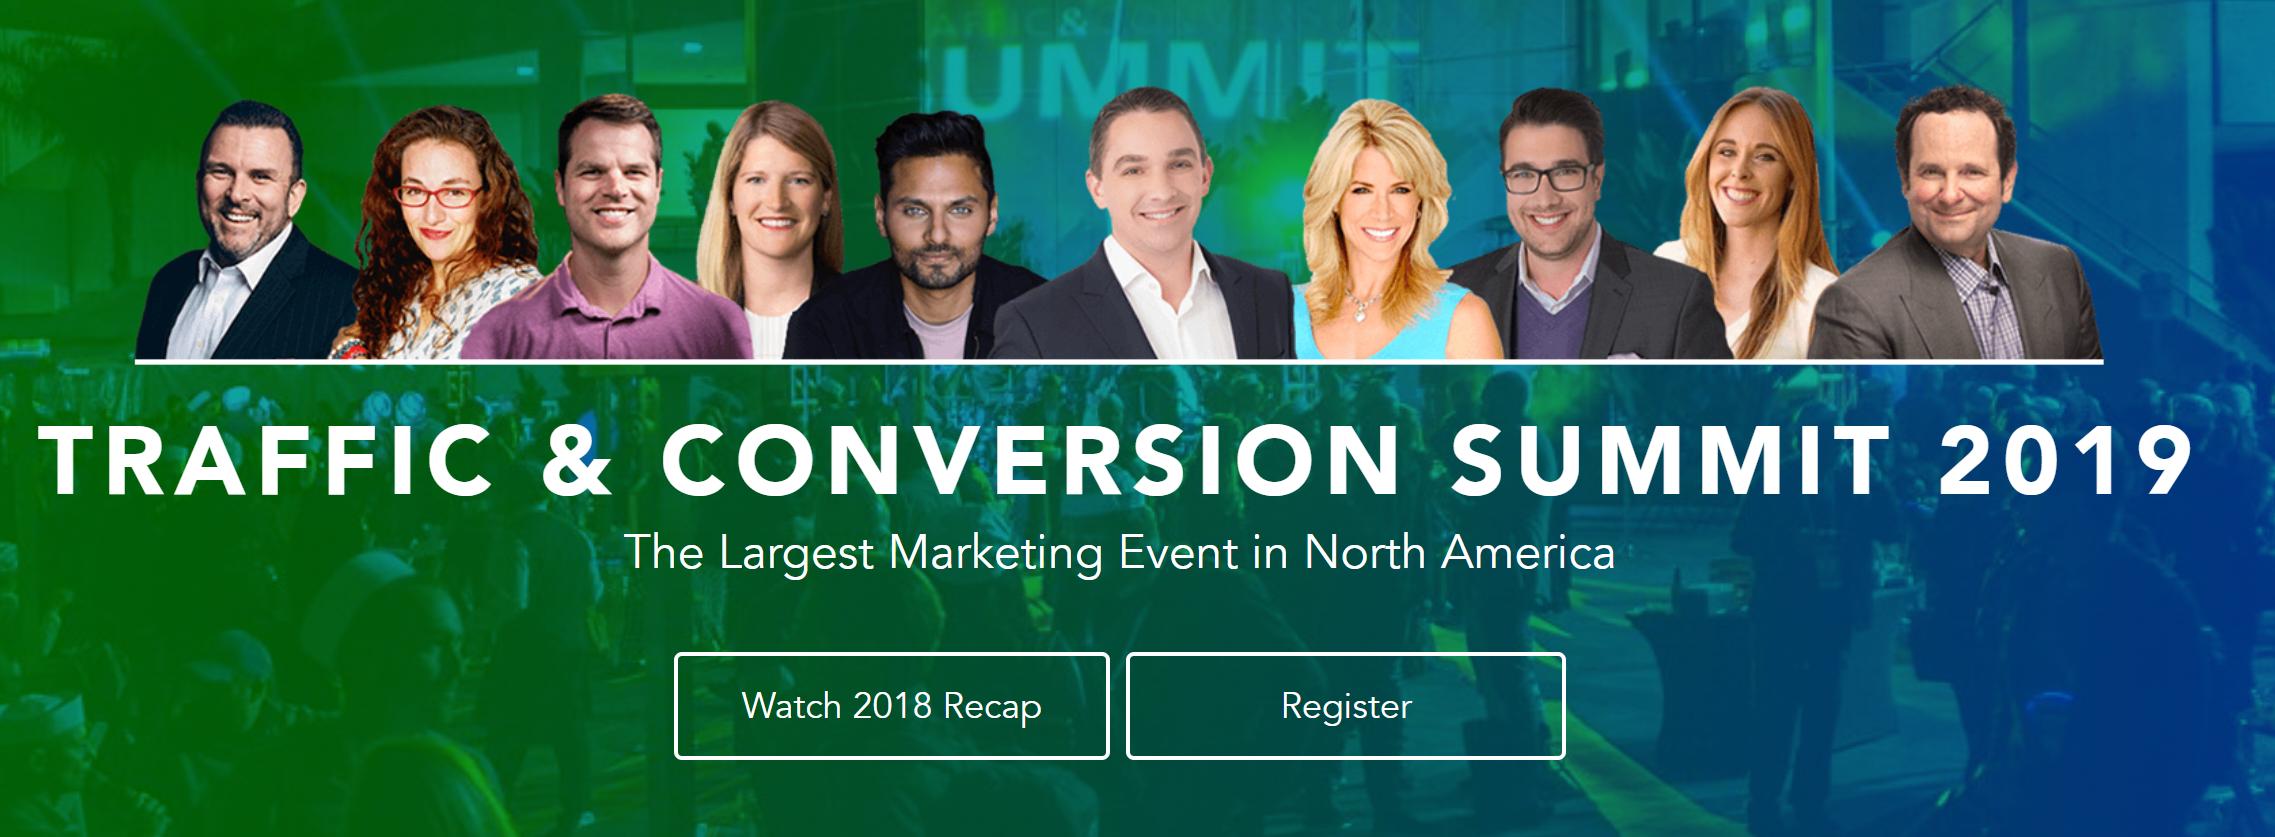 traffic and conversion summit 2019